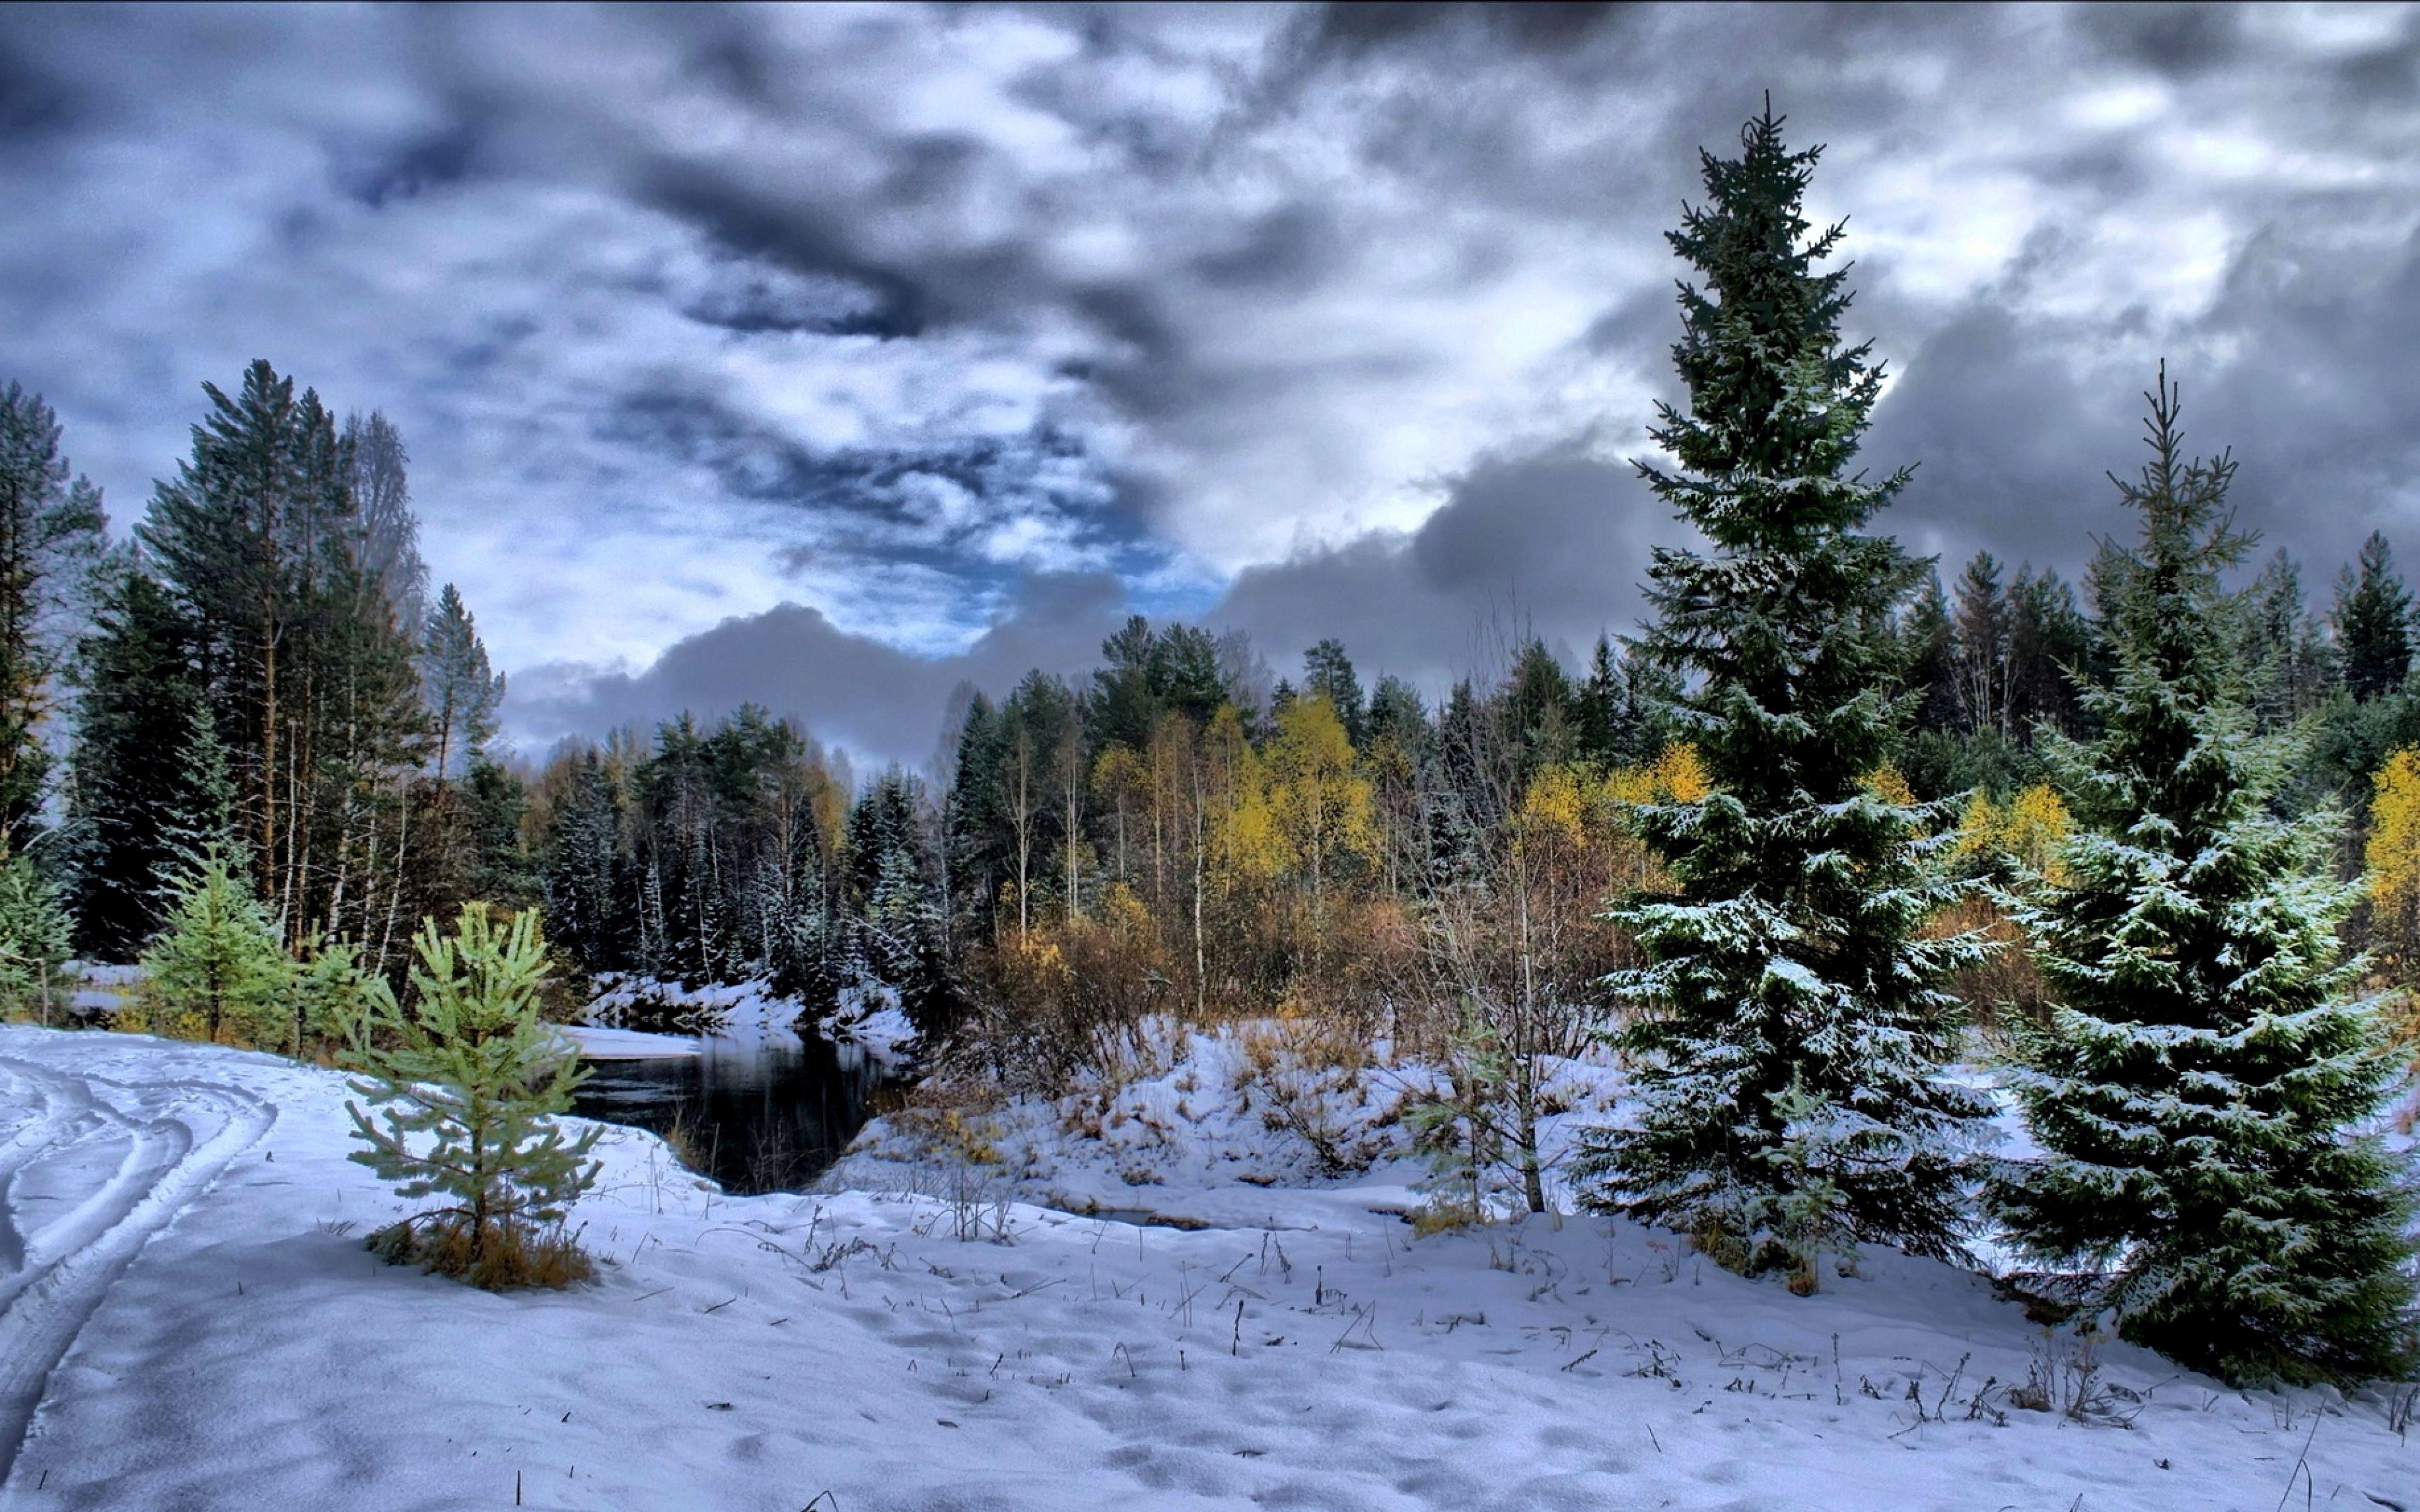 Winter Wallpaper 4k For Mobile Trick In 2020 Winter Scenery Scenery Wallpaper Winter Landscape